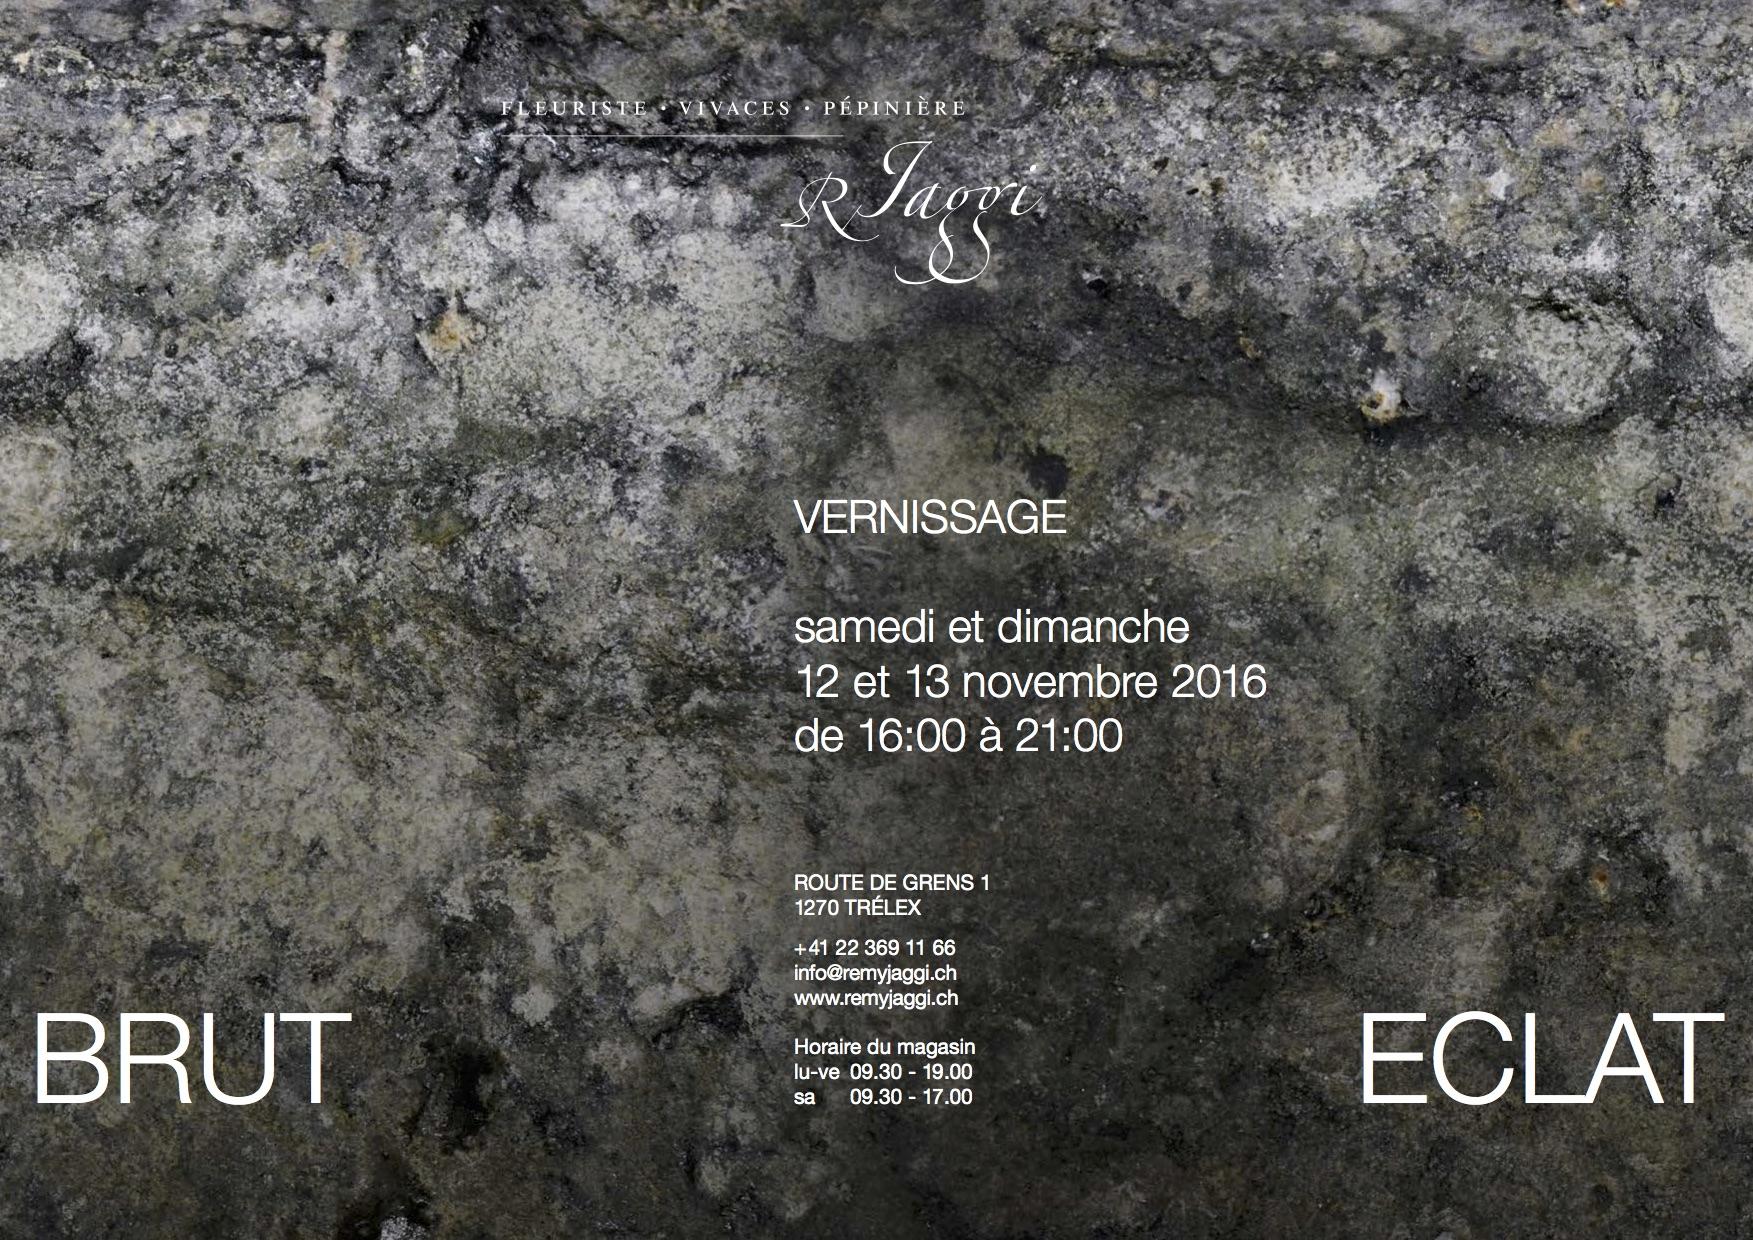 Jaggi-carte-invitation_WEB.jpg